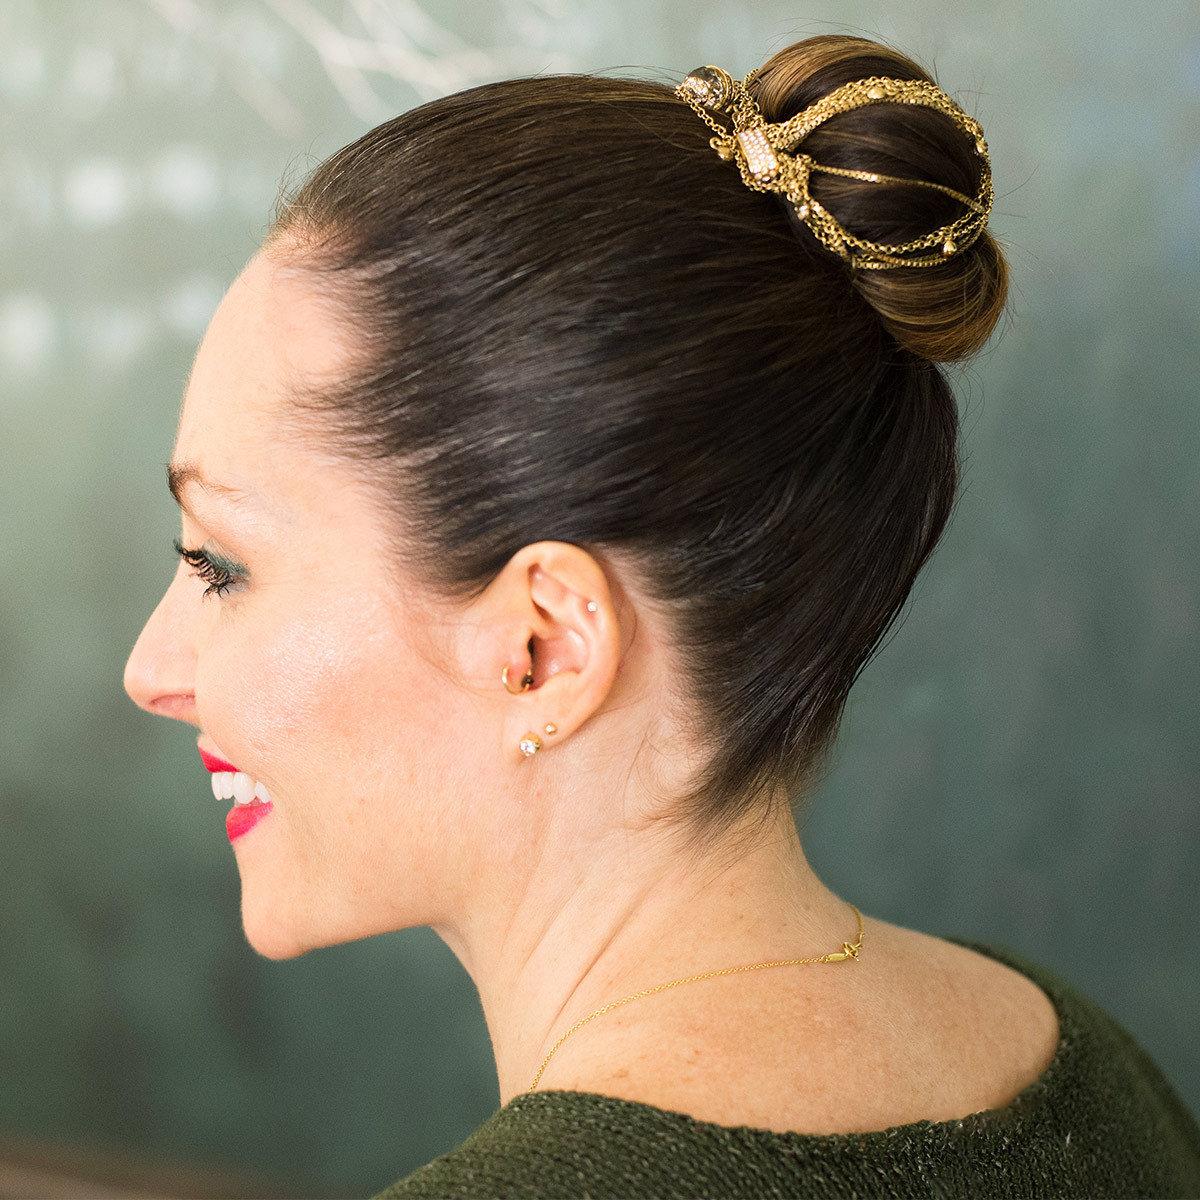 Holiday Hair, Hair Accessories, Ted Gibson, Caitlin Kirenan, Trish Halpin